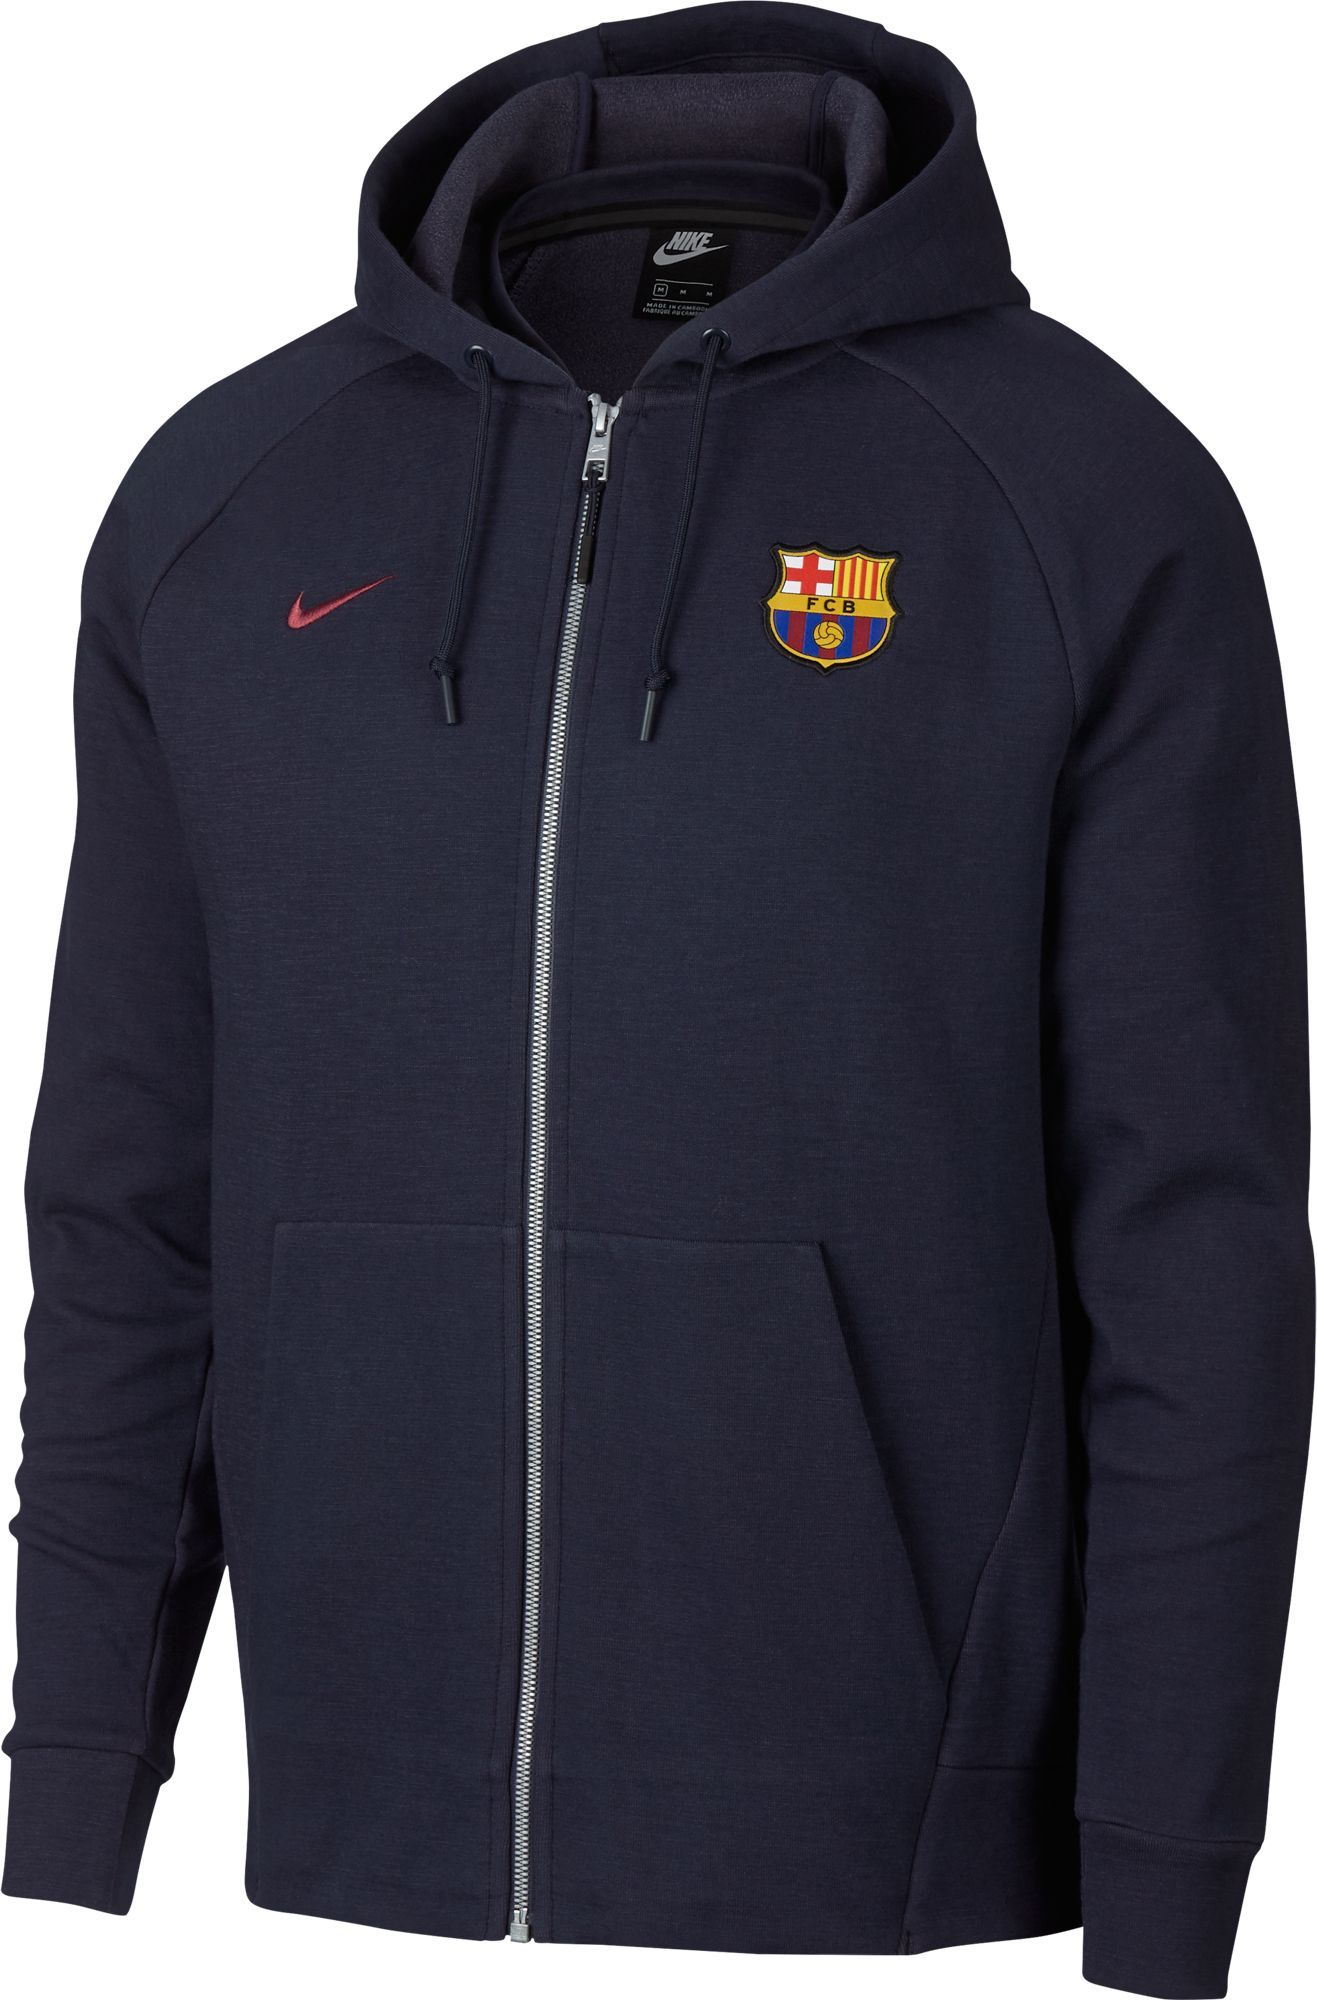 005429b36607 Nike Men s FC Barcelona Navy Full-Zip Hoodie